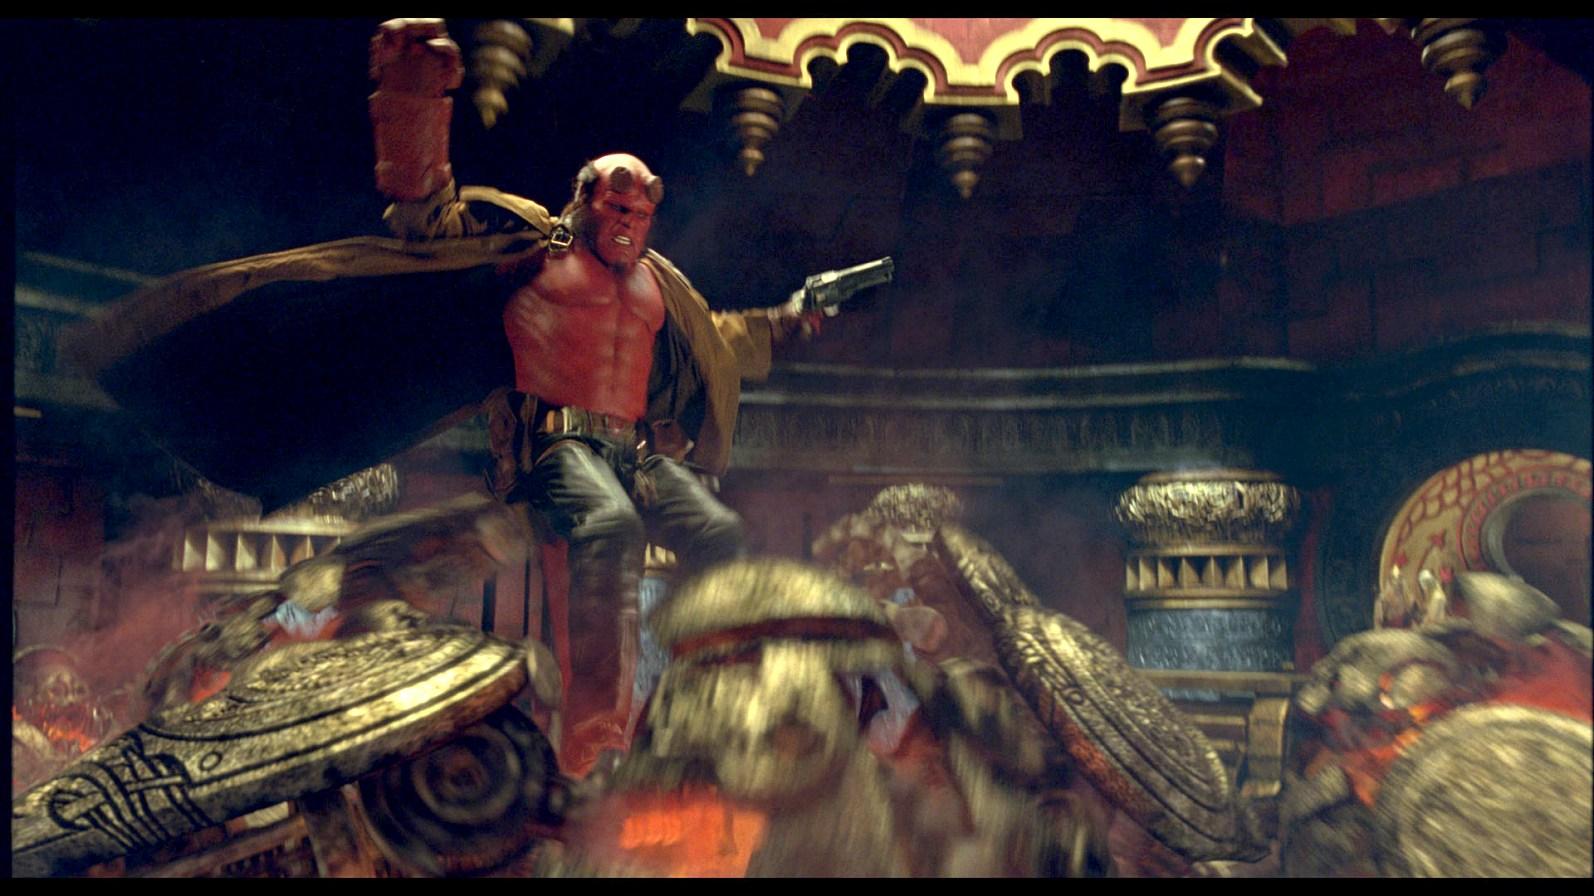 Hellboy II The Golden Army Hellboy 2 2008  Rotten